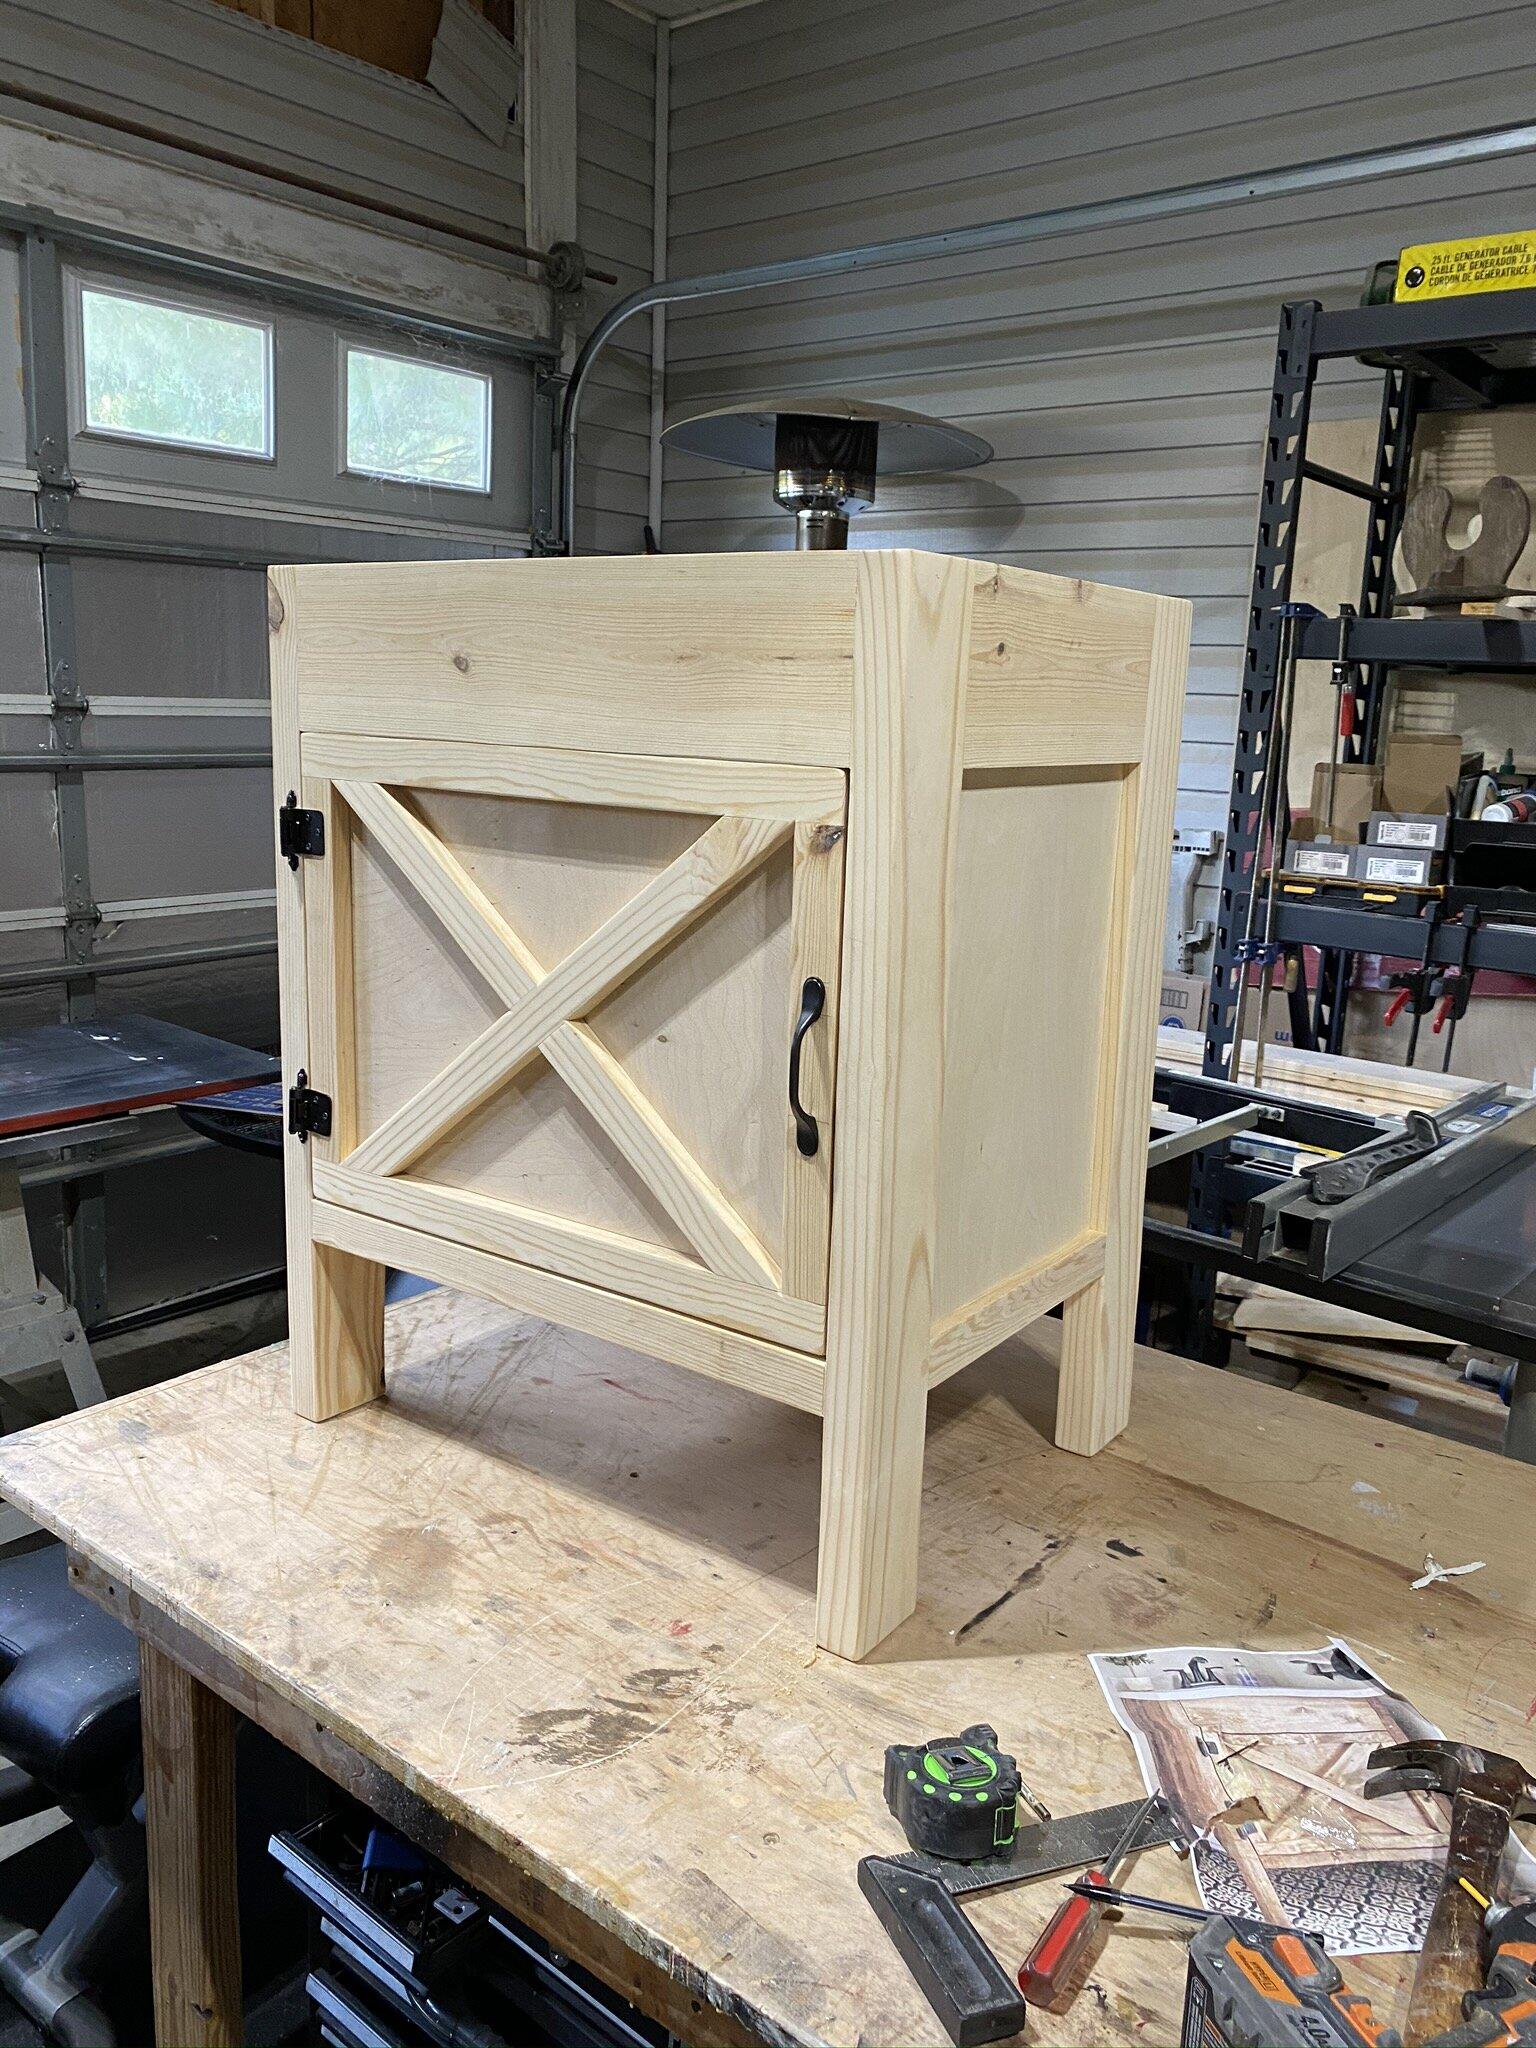 Diy Farmhouse Bathroom Vanity With Plans 731 Woodworks We Build Custom Furniture Diy Guides Monticello Ar